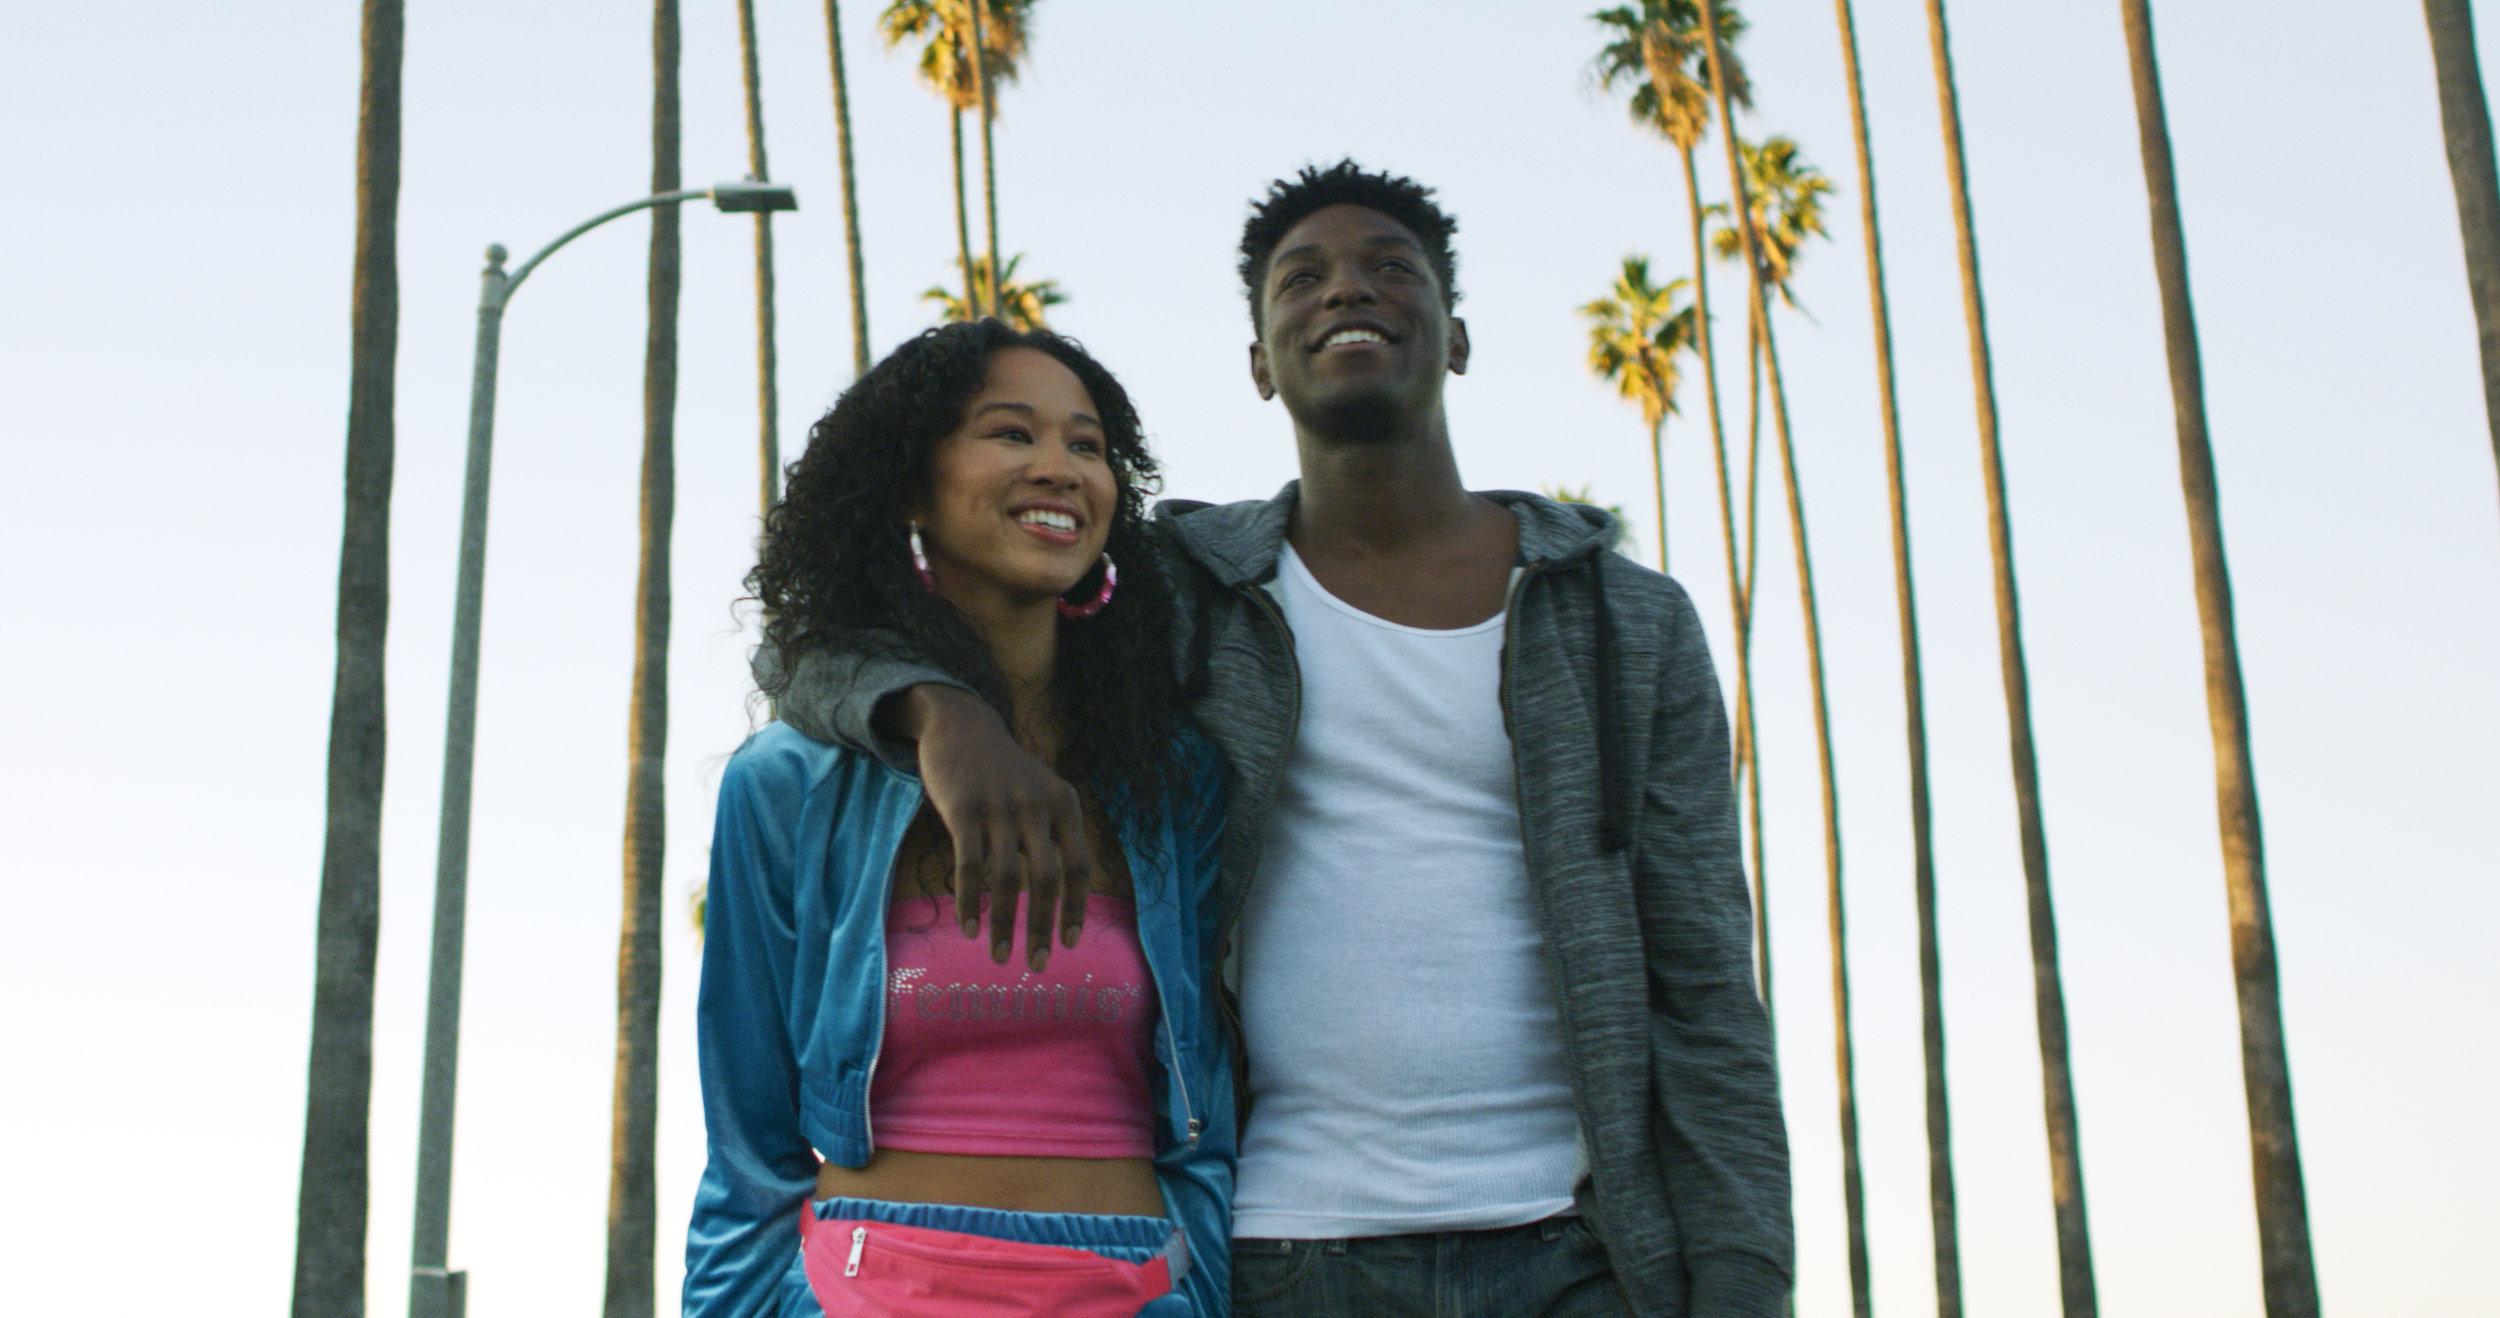 Christina Cooper and Jamal Henderson